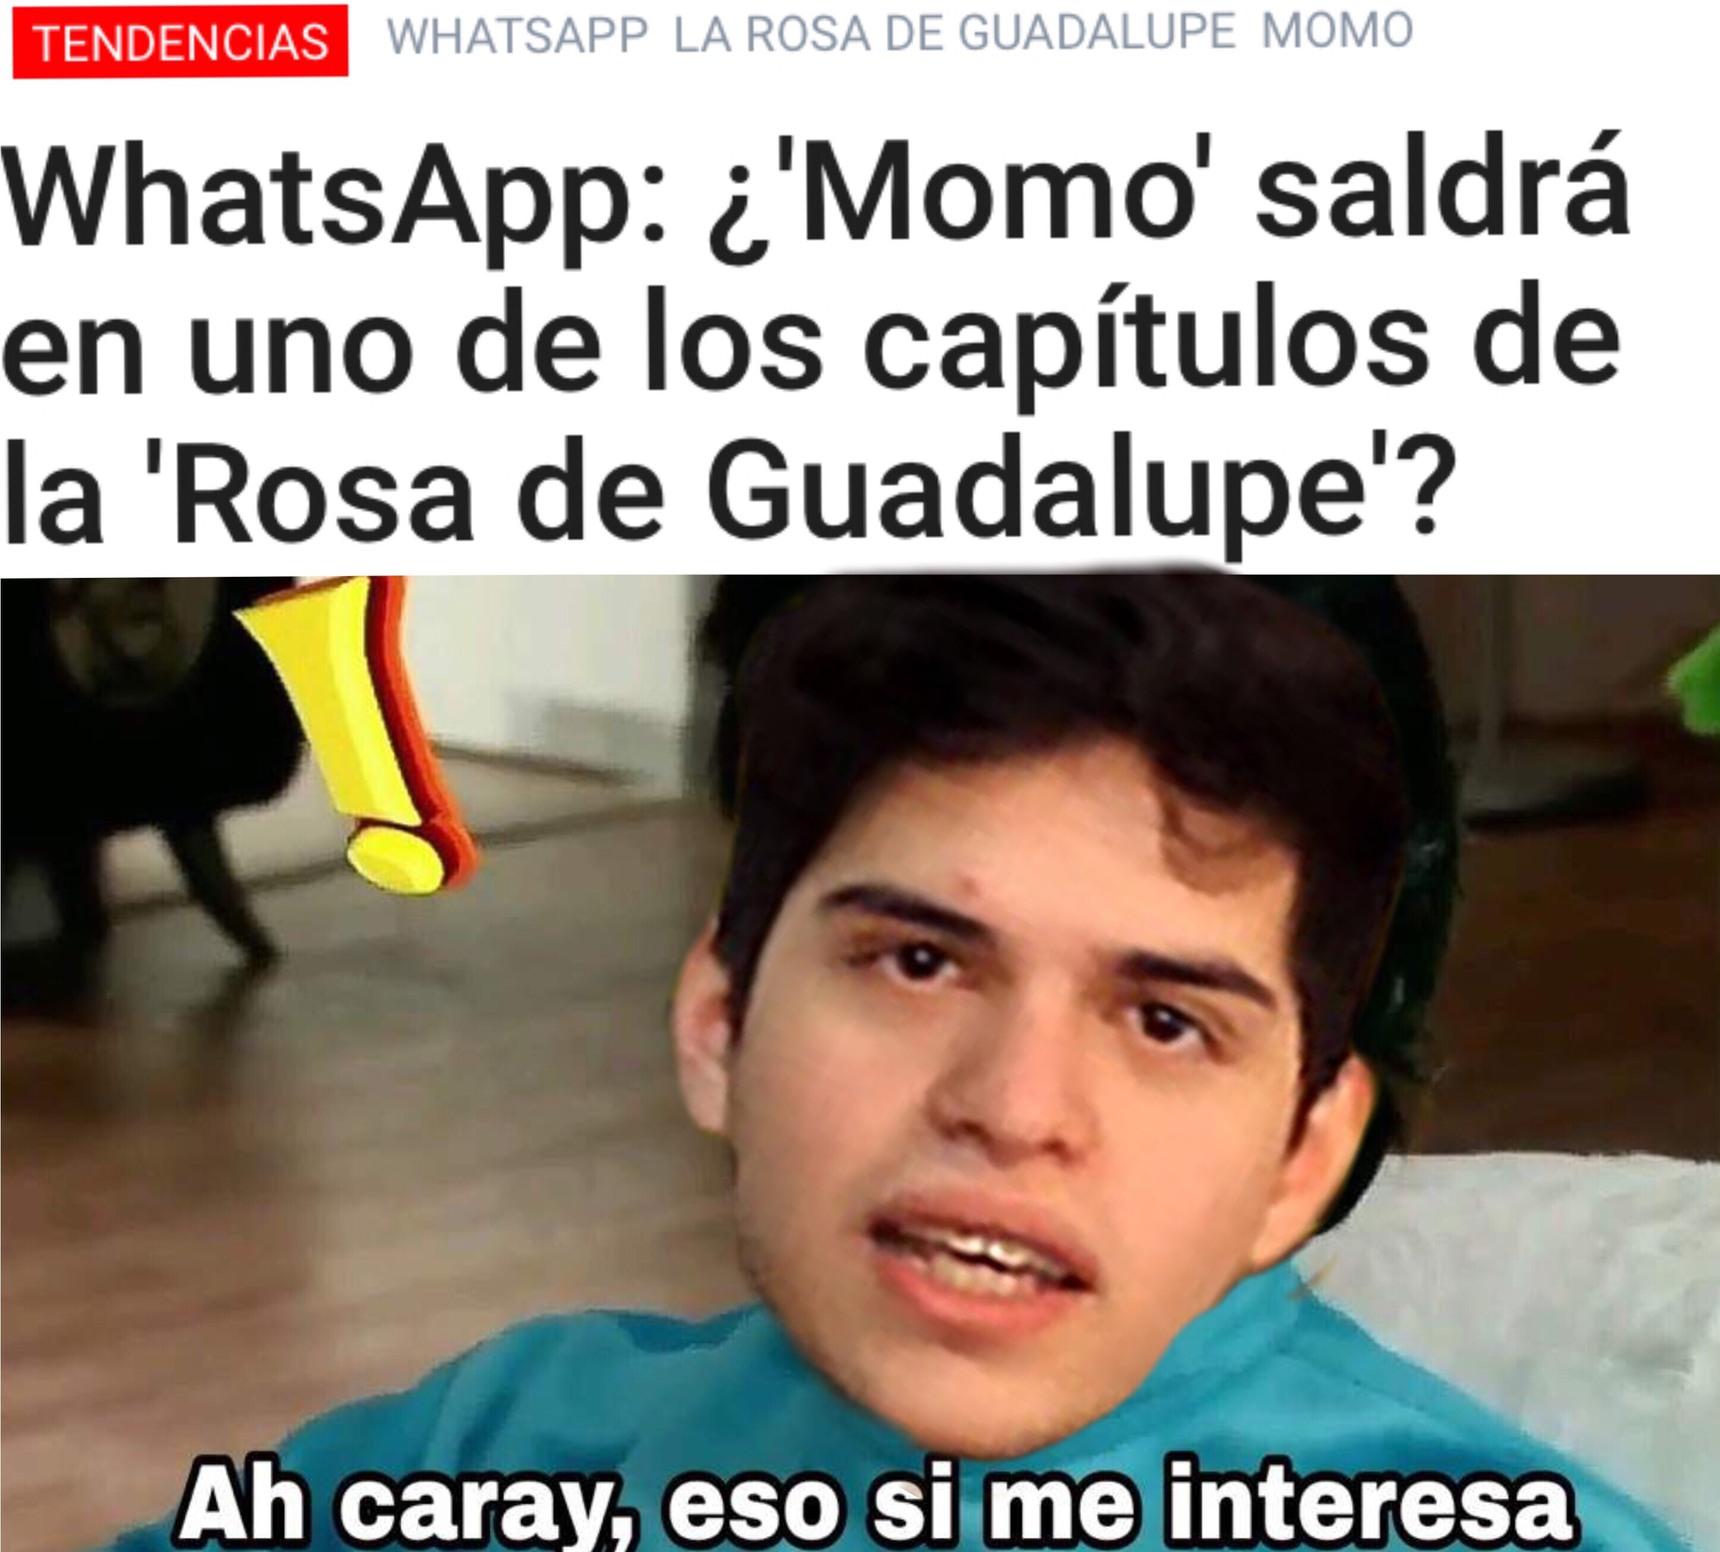 La Rosa De Guadalupe se renueva - meme